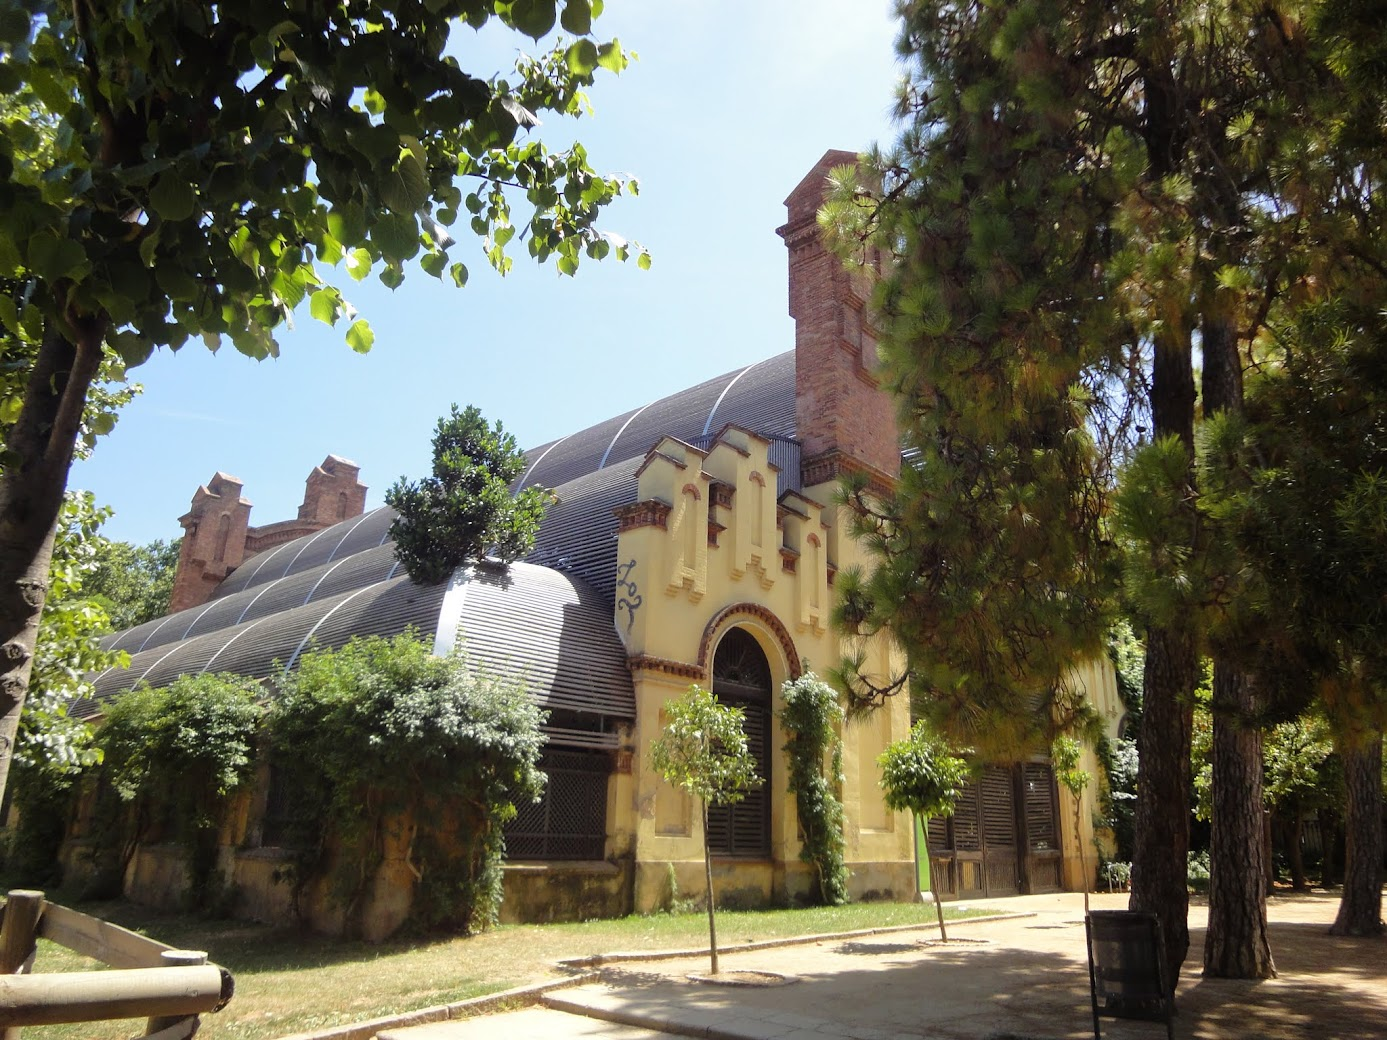 Umbracle au Parc Ciutadella à Barcelone